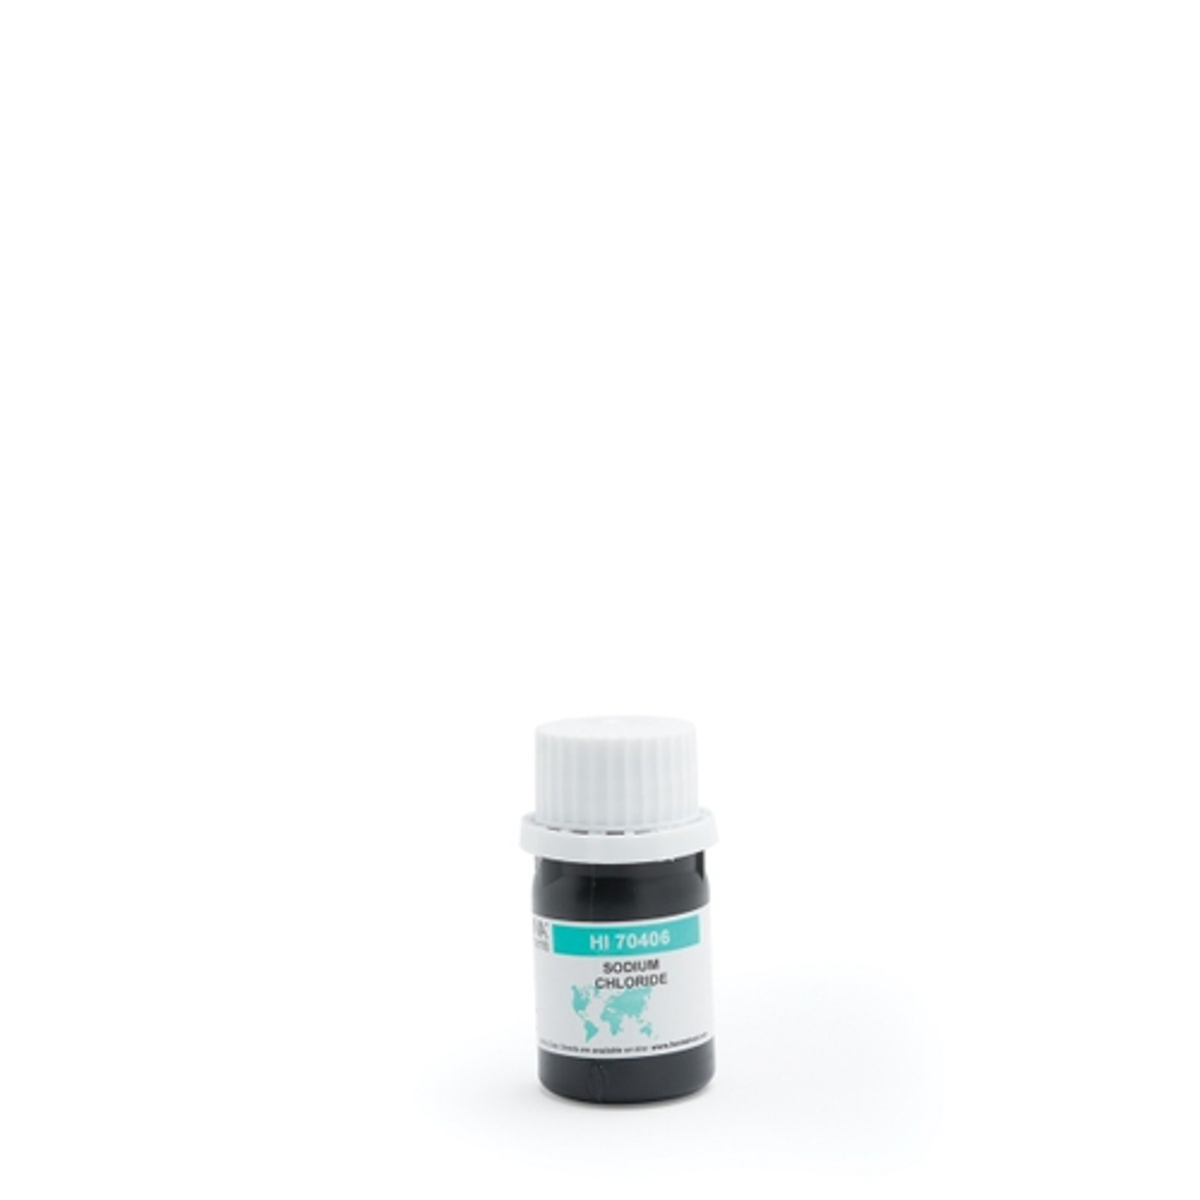 Sodium Chloride Standard Reagent, 20 g - HI70406